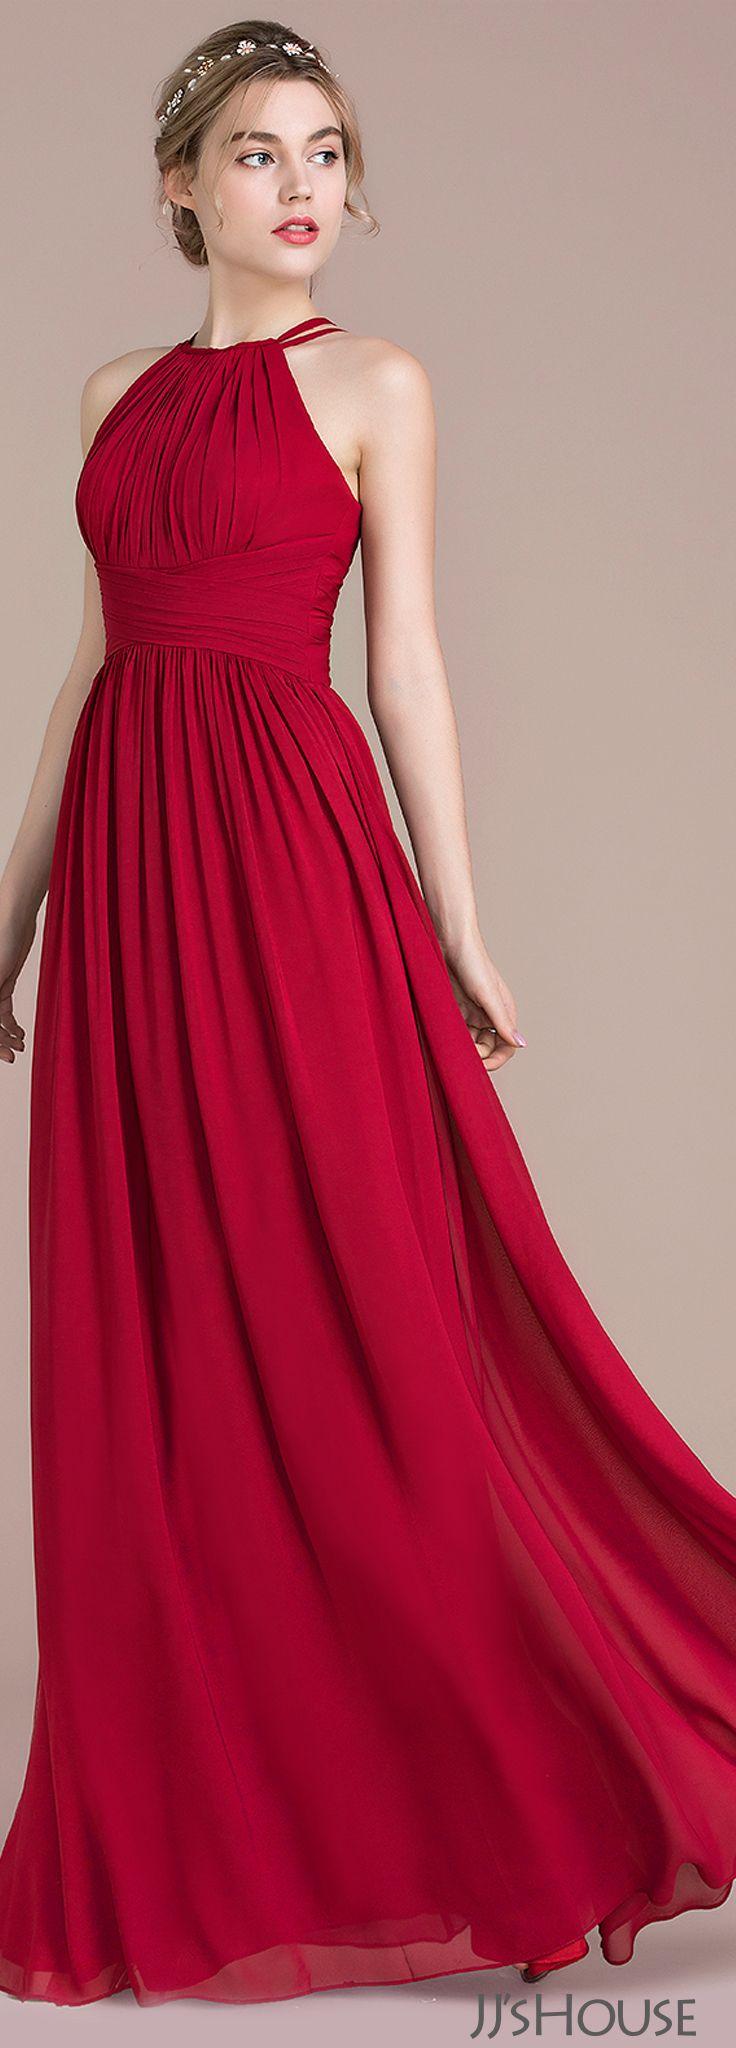 Follow for more interest pins pinterest em na vestidos